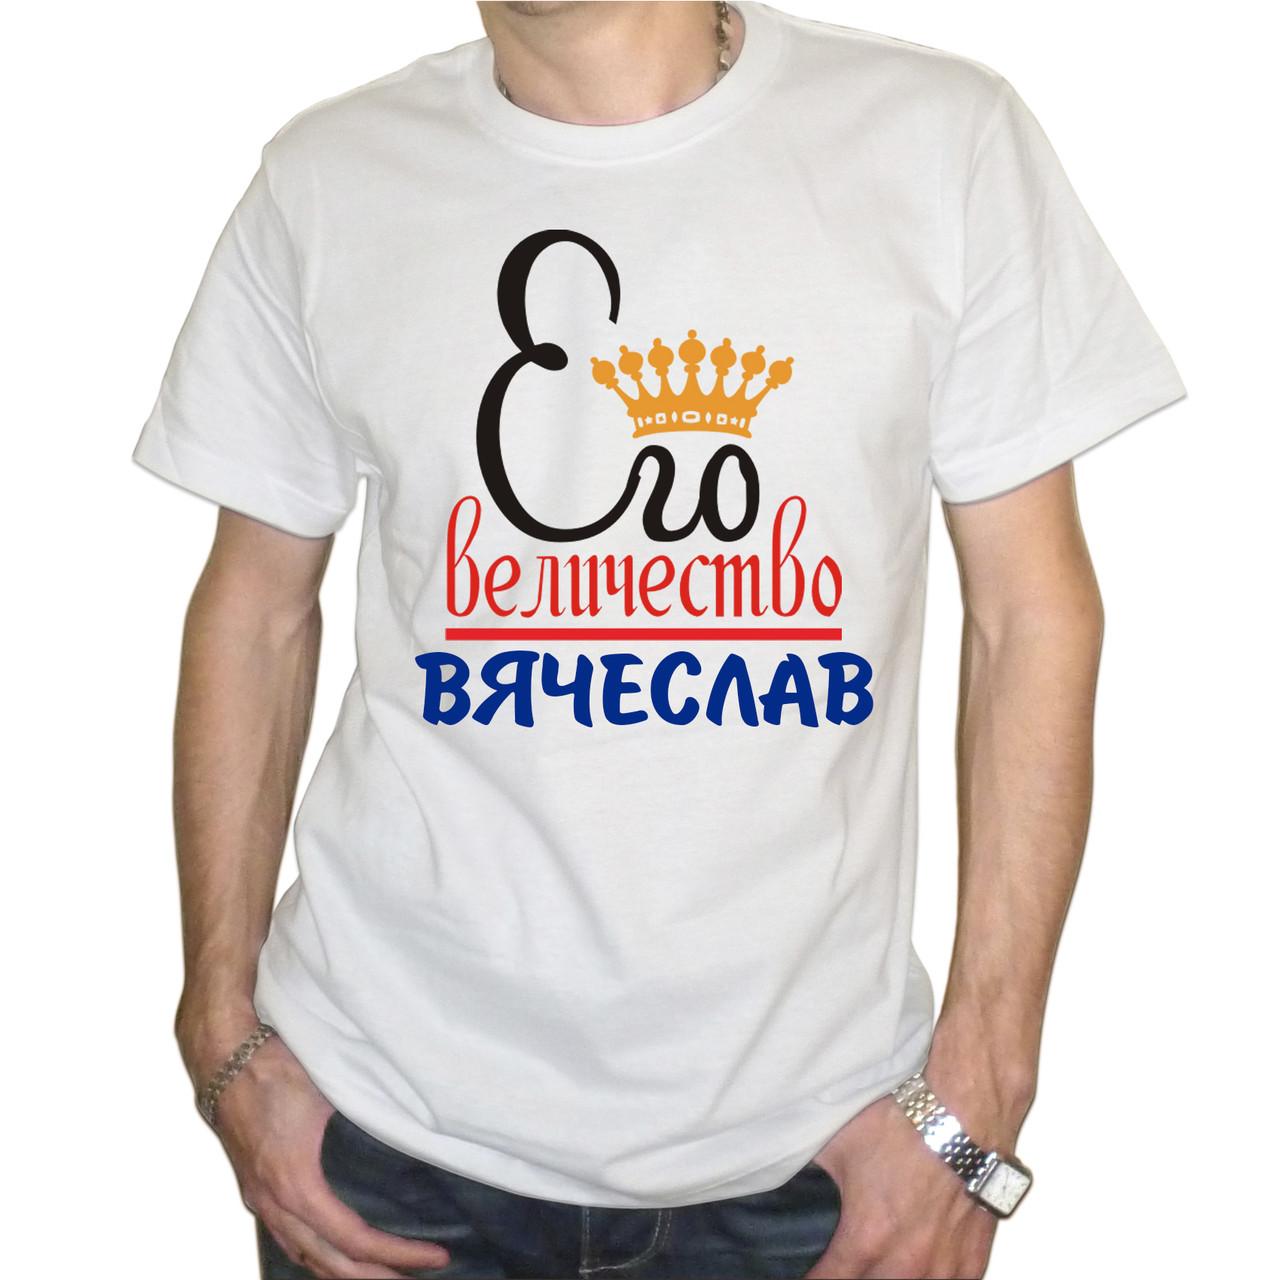 "Мужская футболка ""Его величество Вячеслав"""